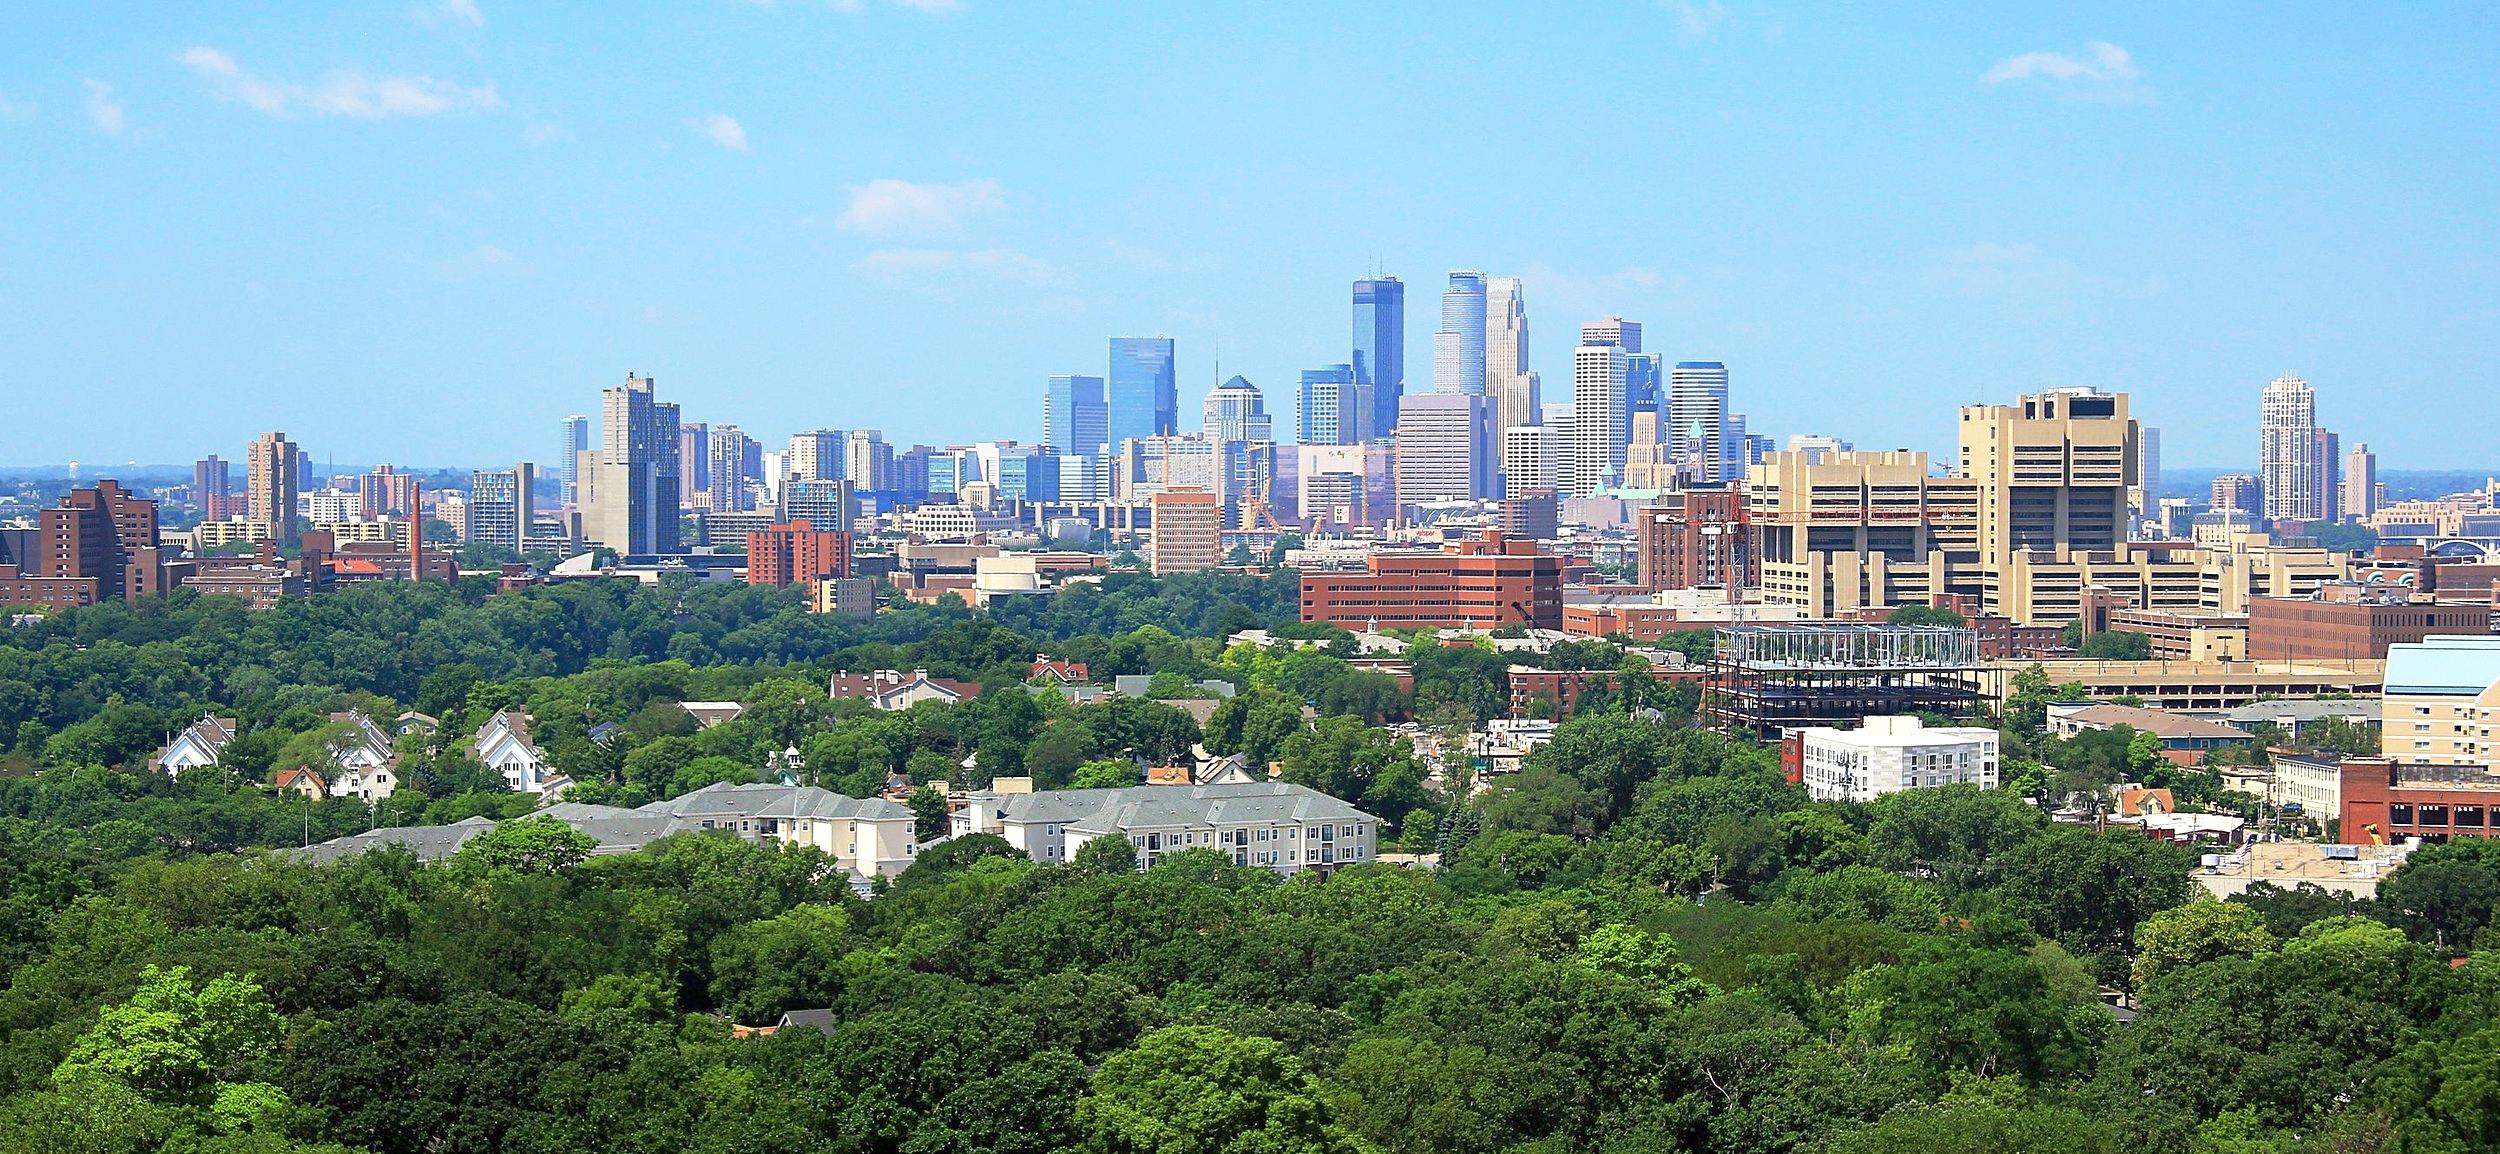 Minneapolis_skyline_from_Prospect_Park_Water_Tower,_July_2014.jpg